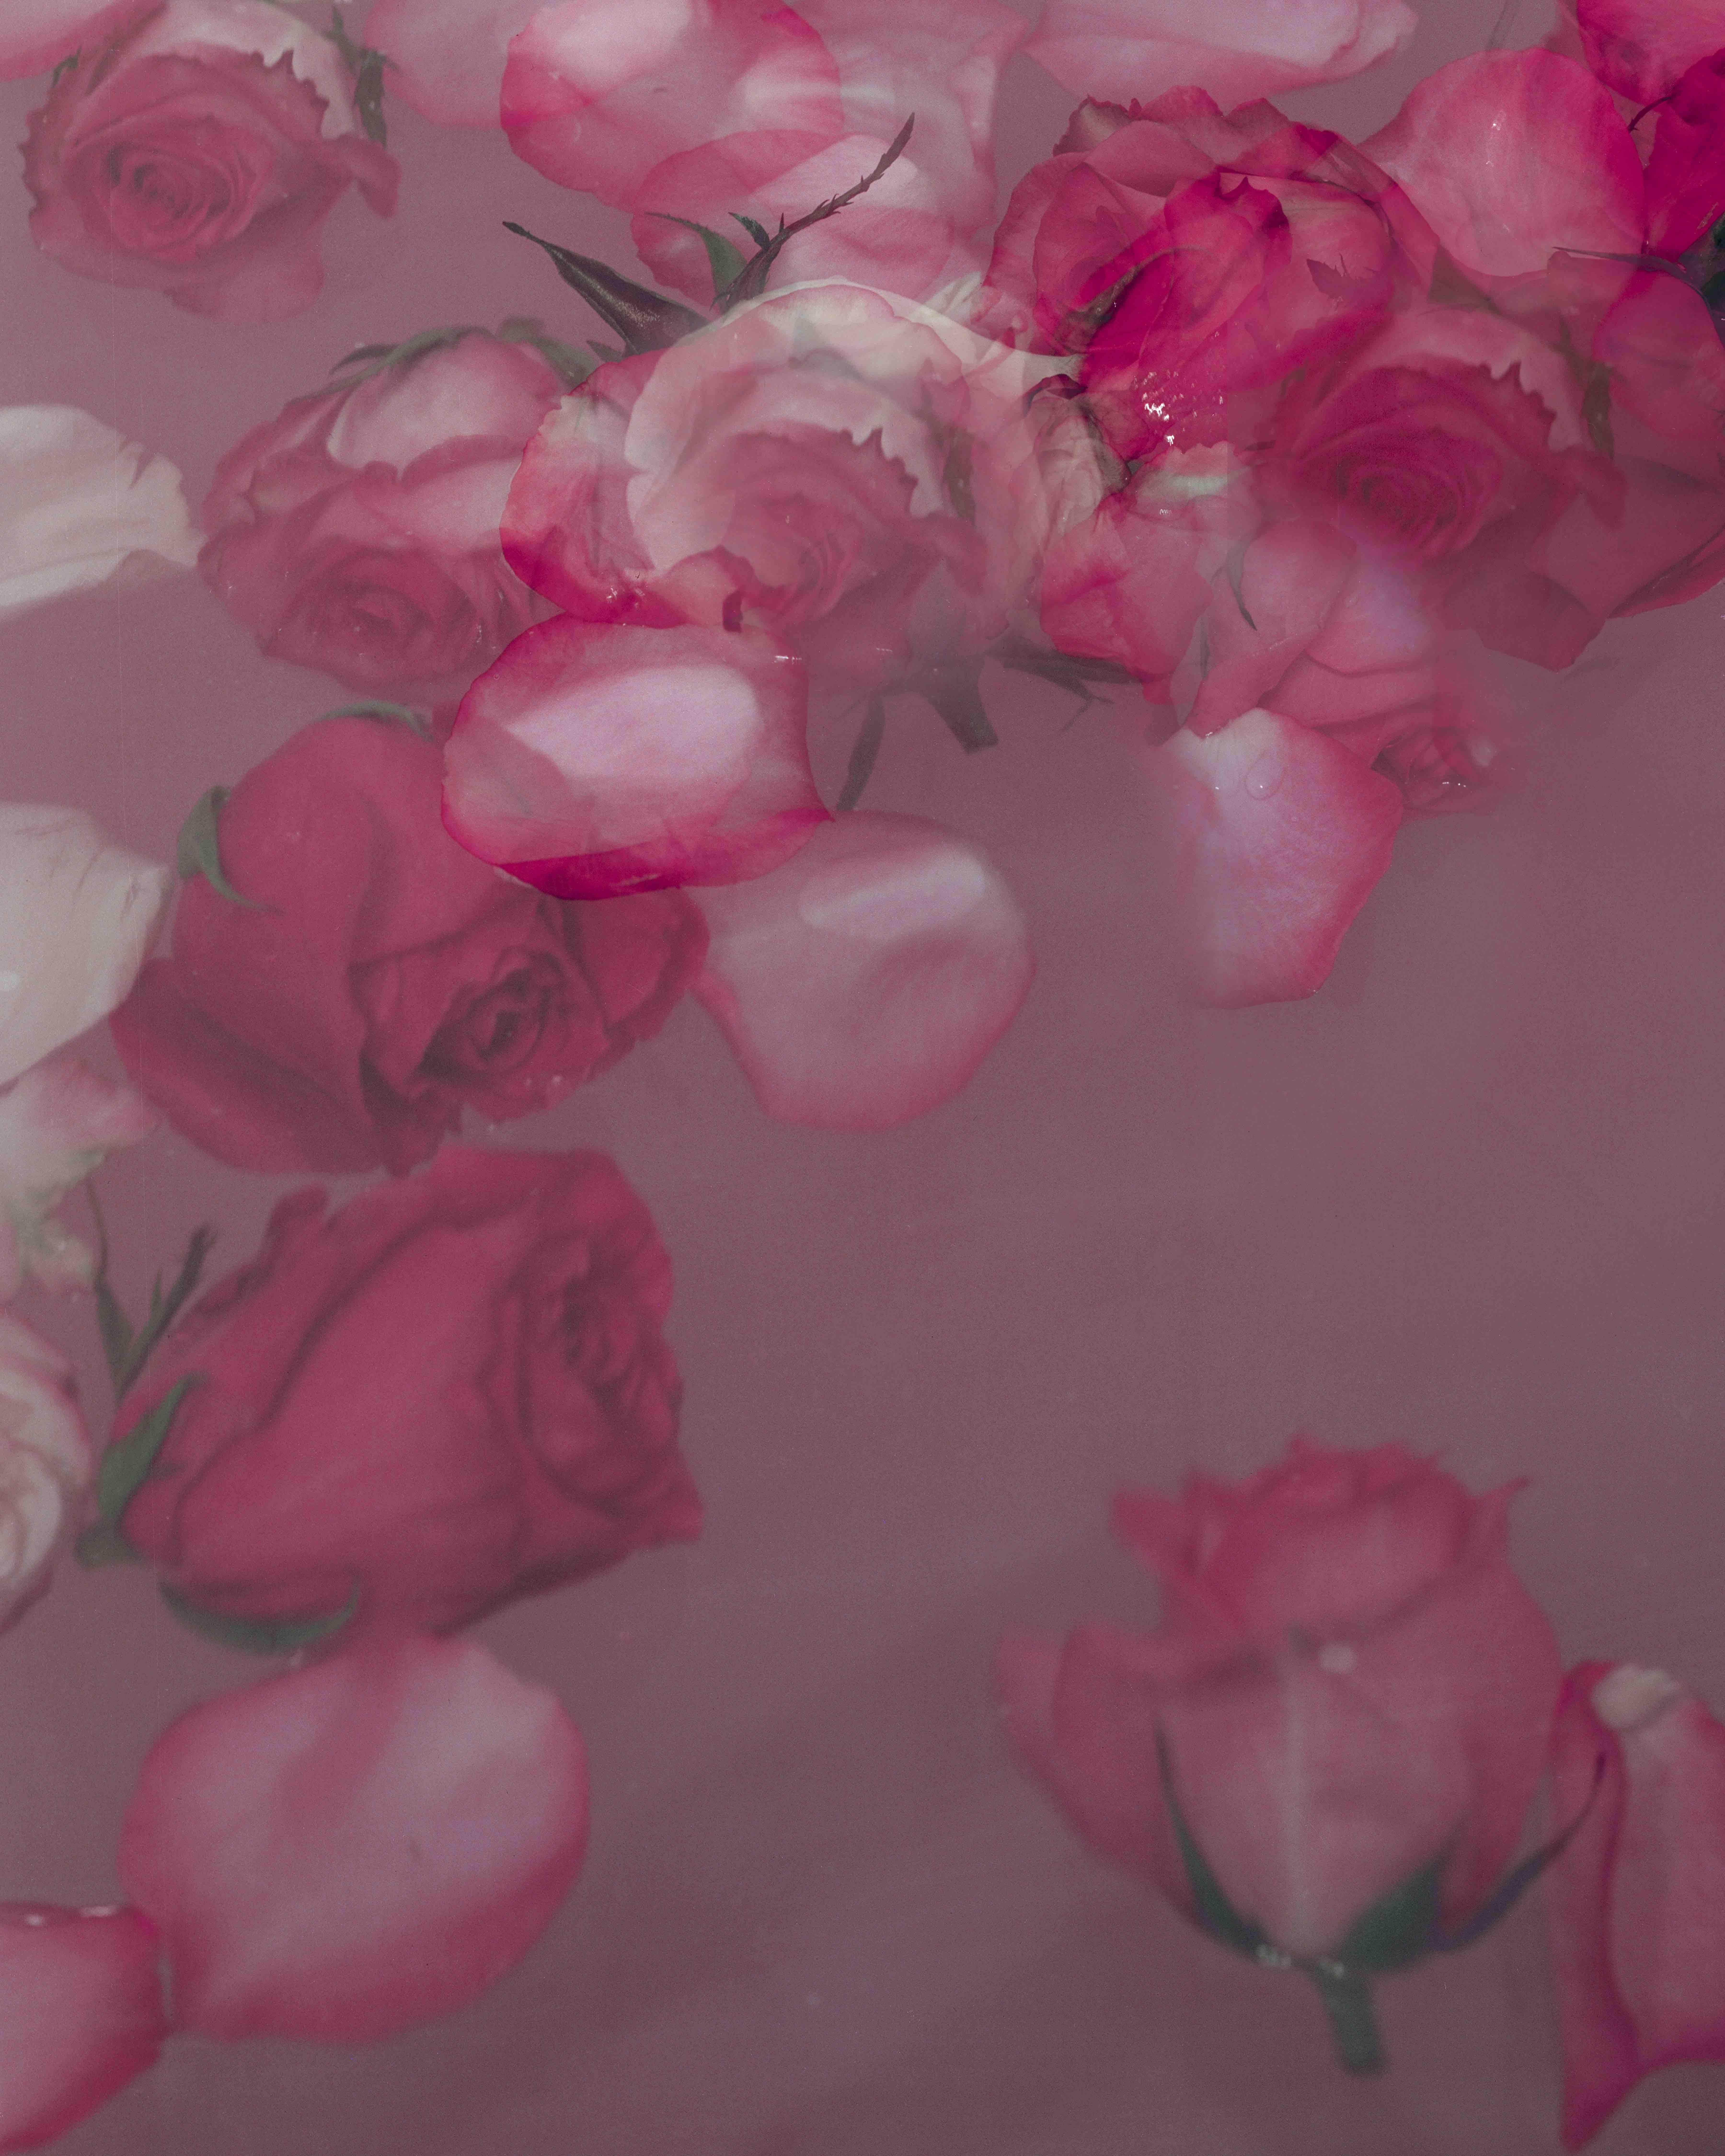 Copy of roses3 copy.jpg